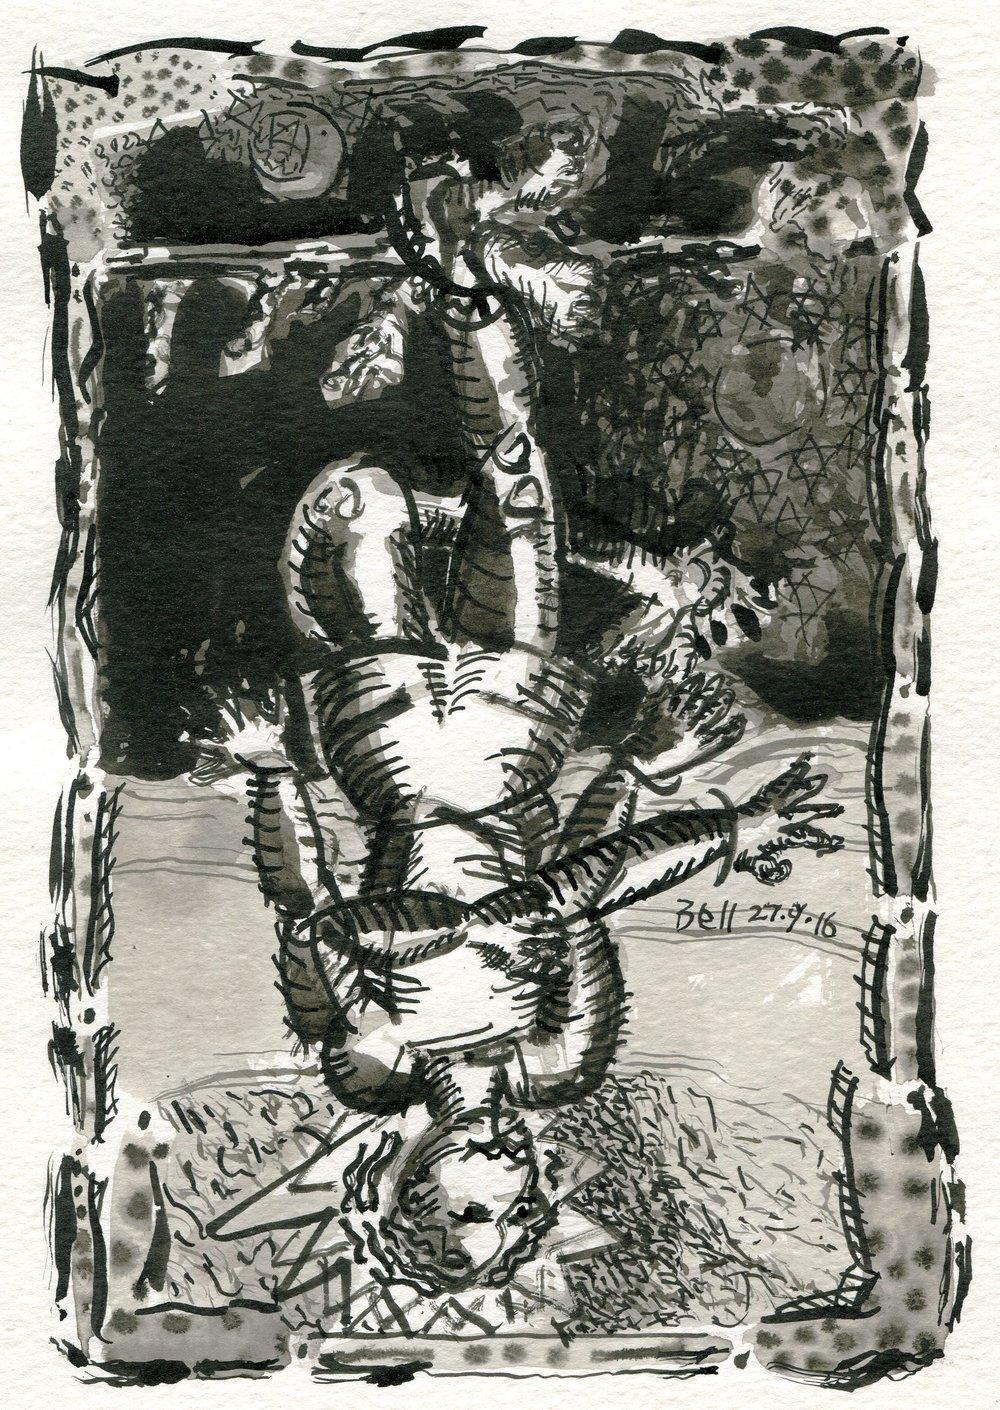 69b Brendan Bell, The Hanged Man, Brush & ink on paper